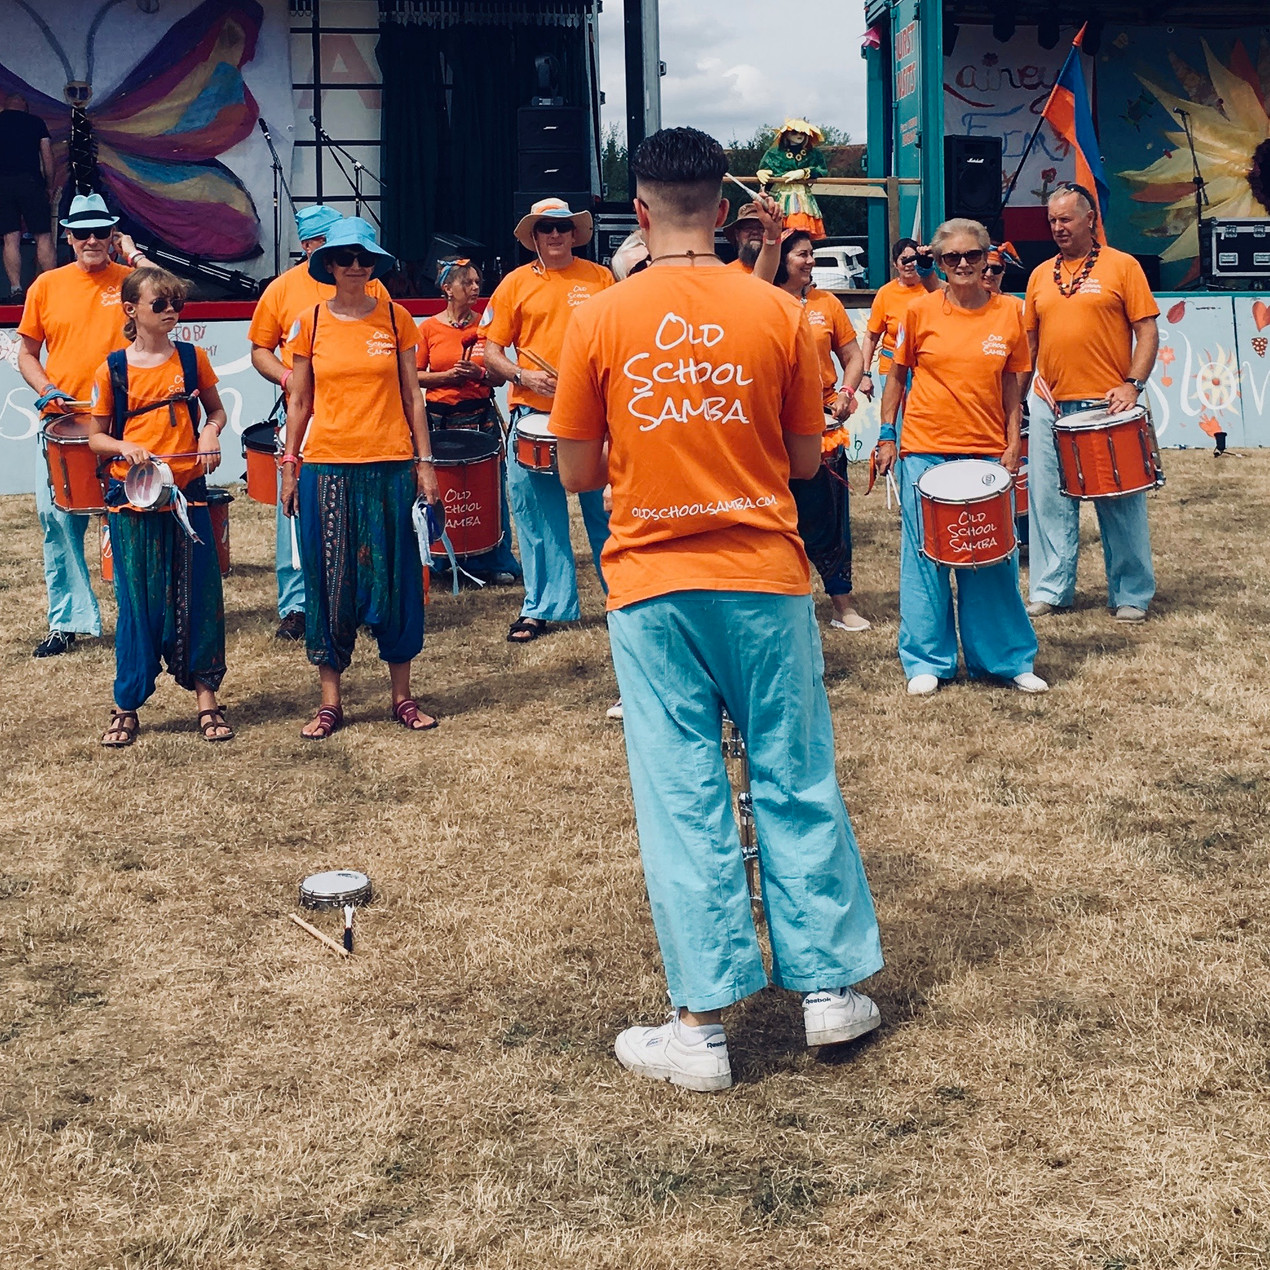 Old School Samba band performing at Littlefest 2018 near Staplehurst Kent